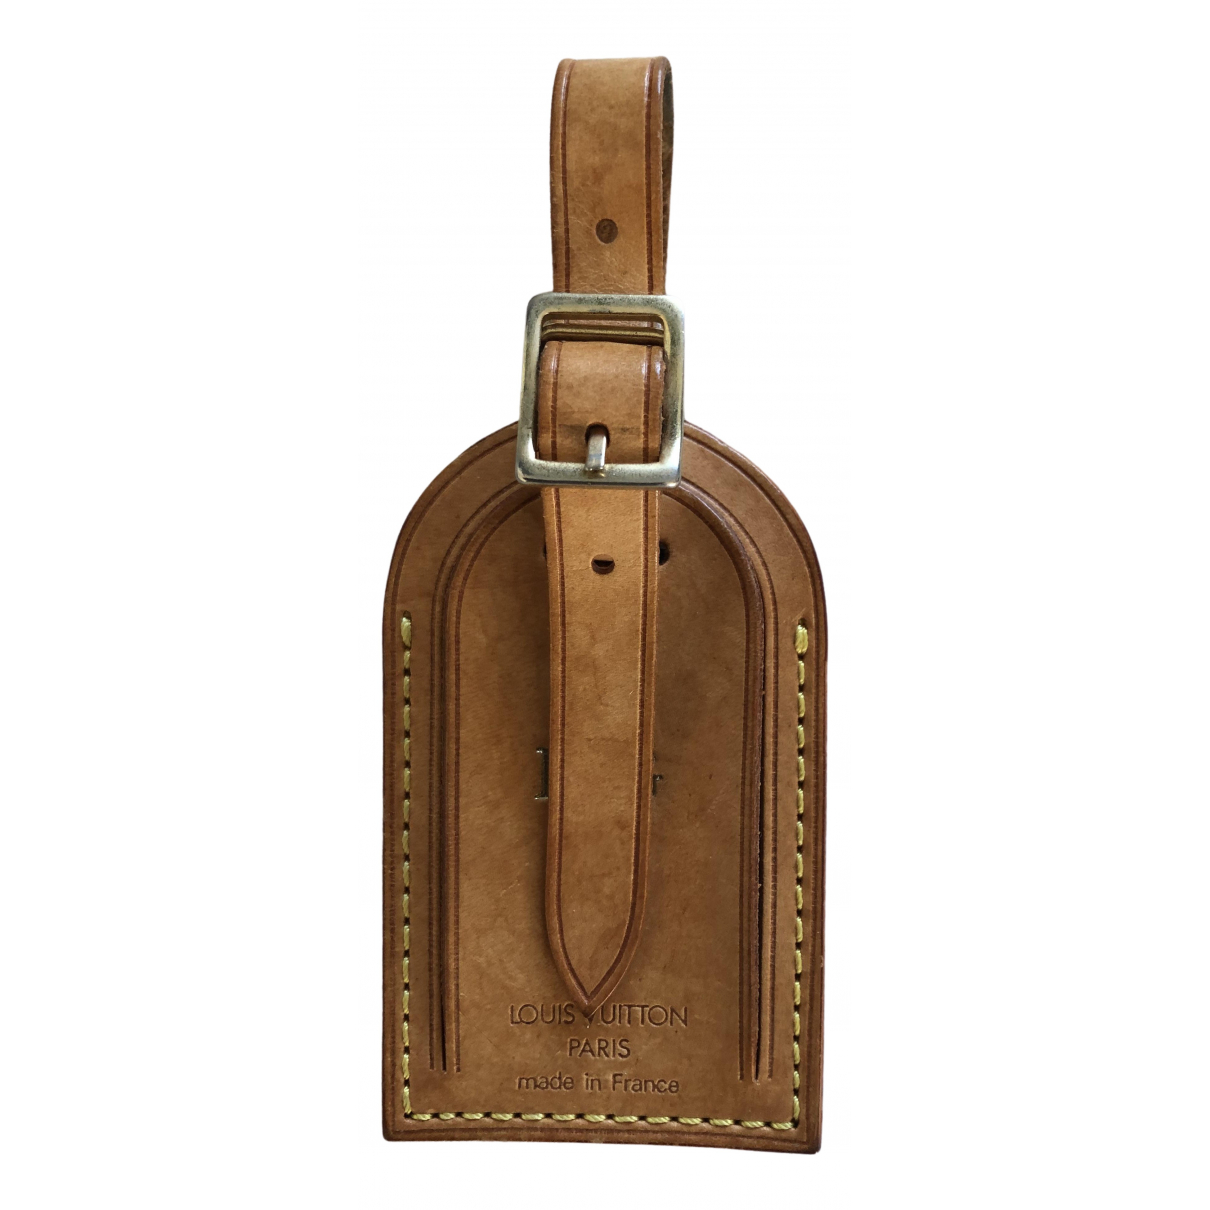 Louis Vuitton Porte adresse Kleinlederwaren in  Kamel Leder